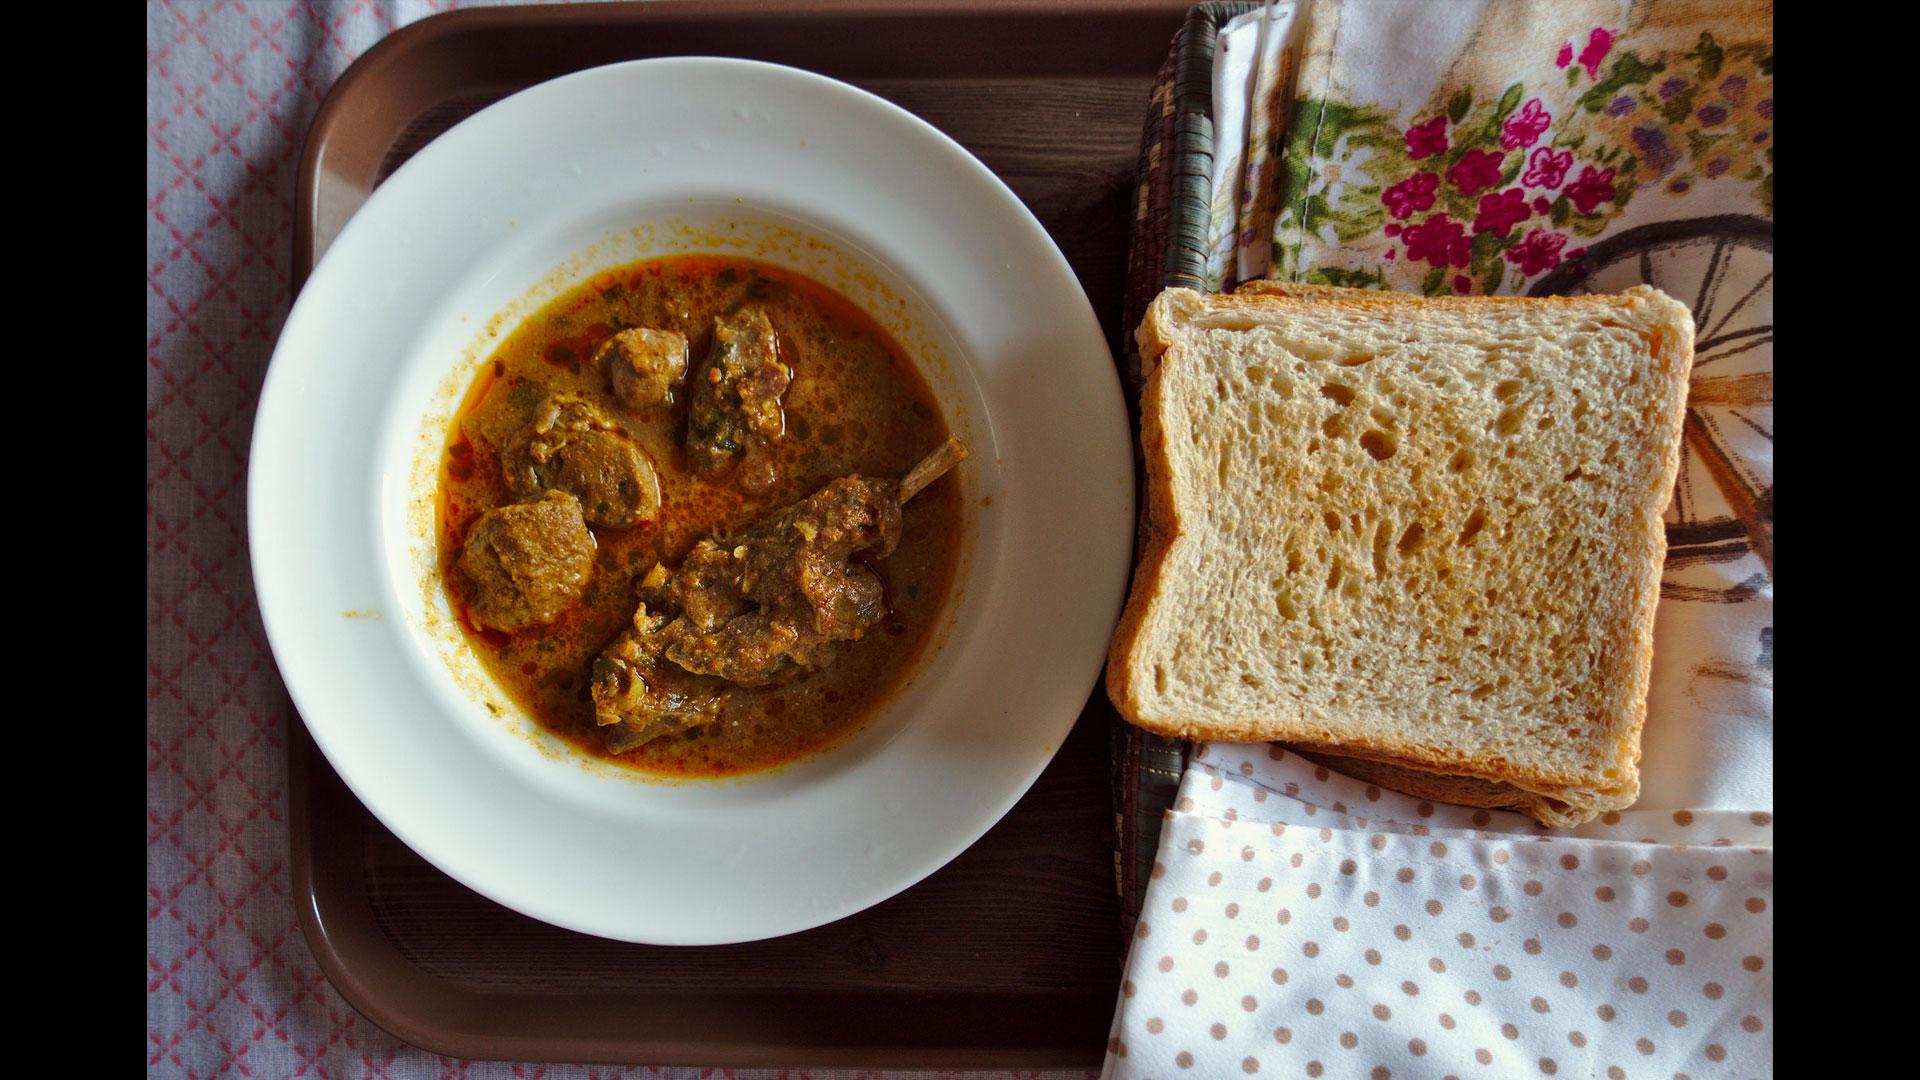 Food   Photographer: Mazhar KhanCurator: Bryan Esler